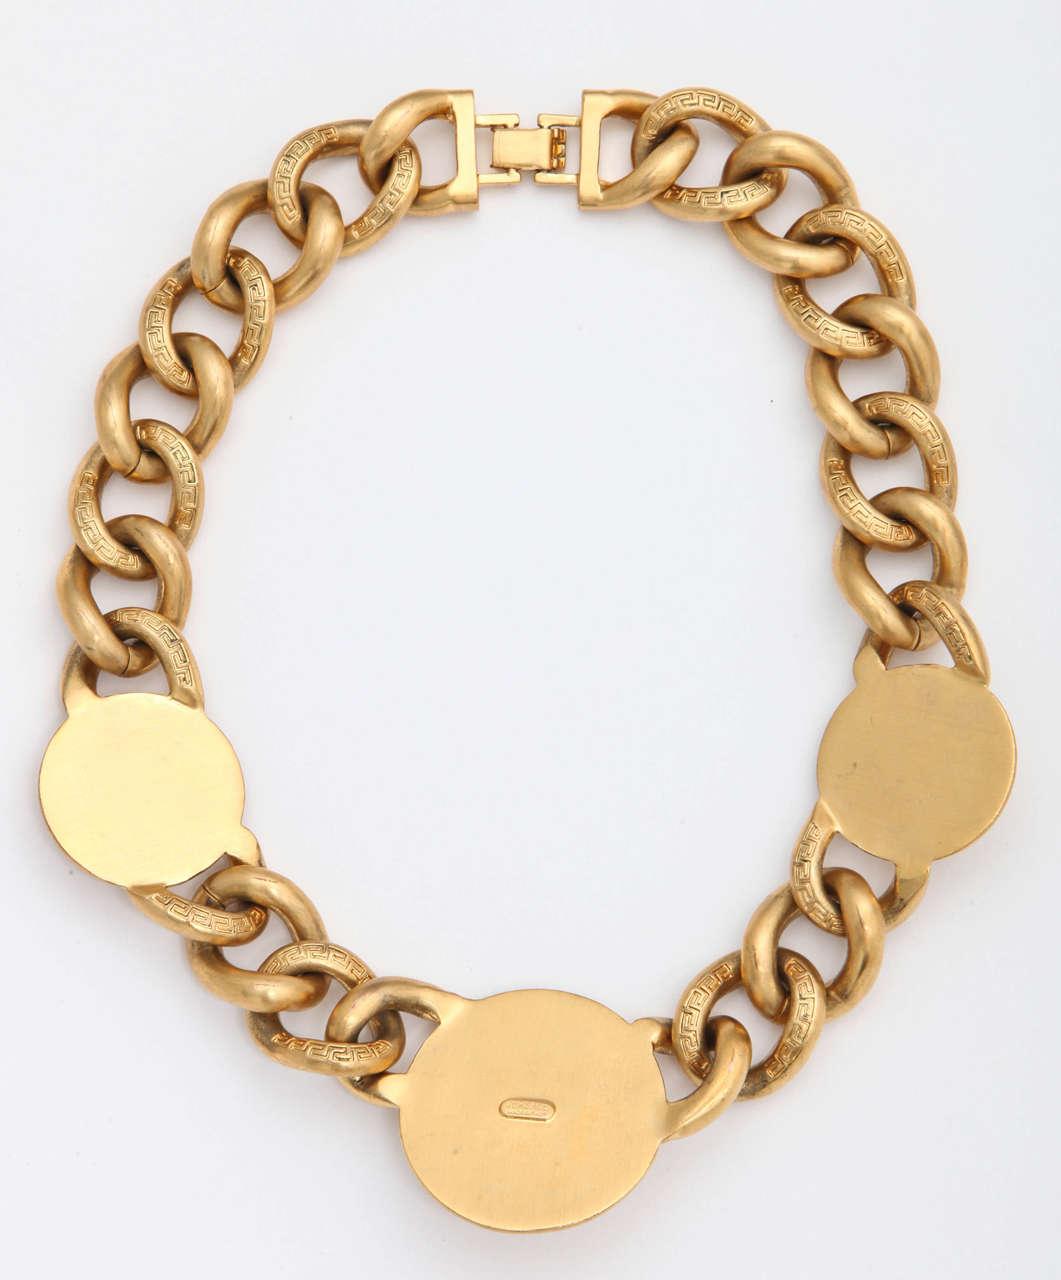 versace 3 medusa gold chain necklace image 4